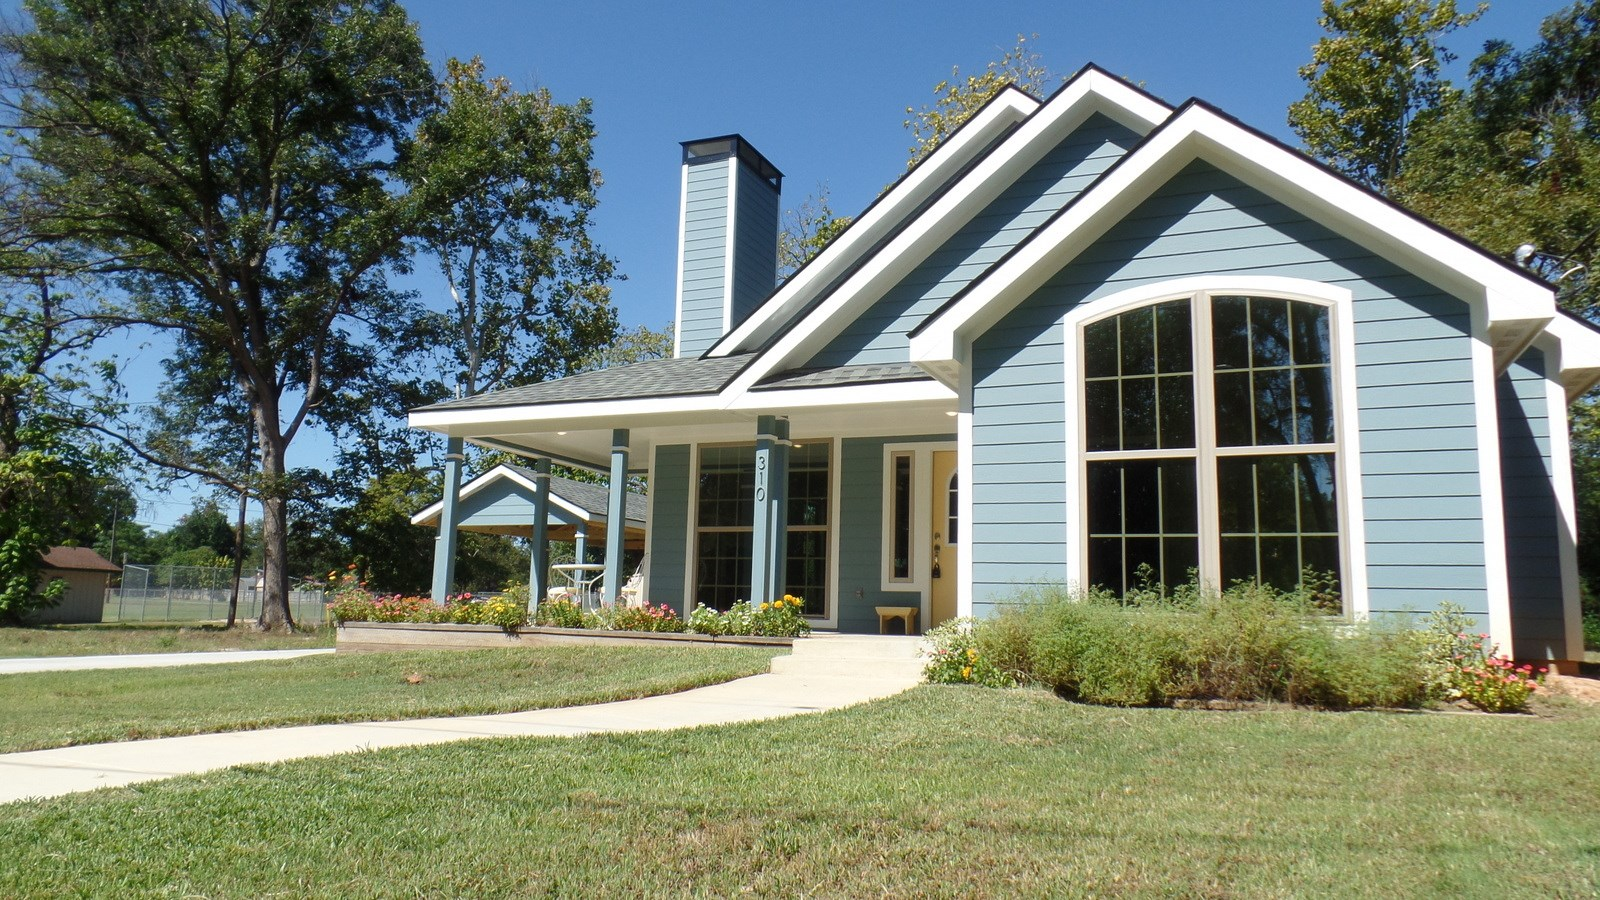 WINNSBORO TEXAS NEW 2019 BUILT HOME FOR SALE